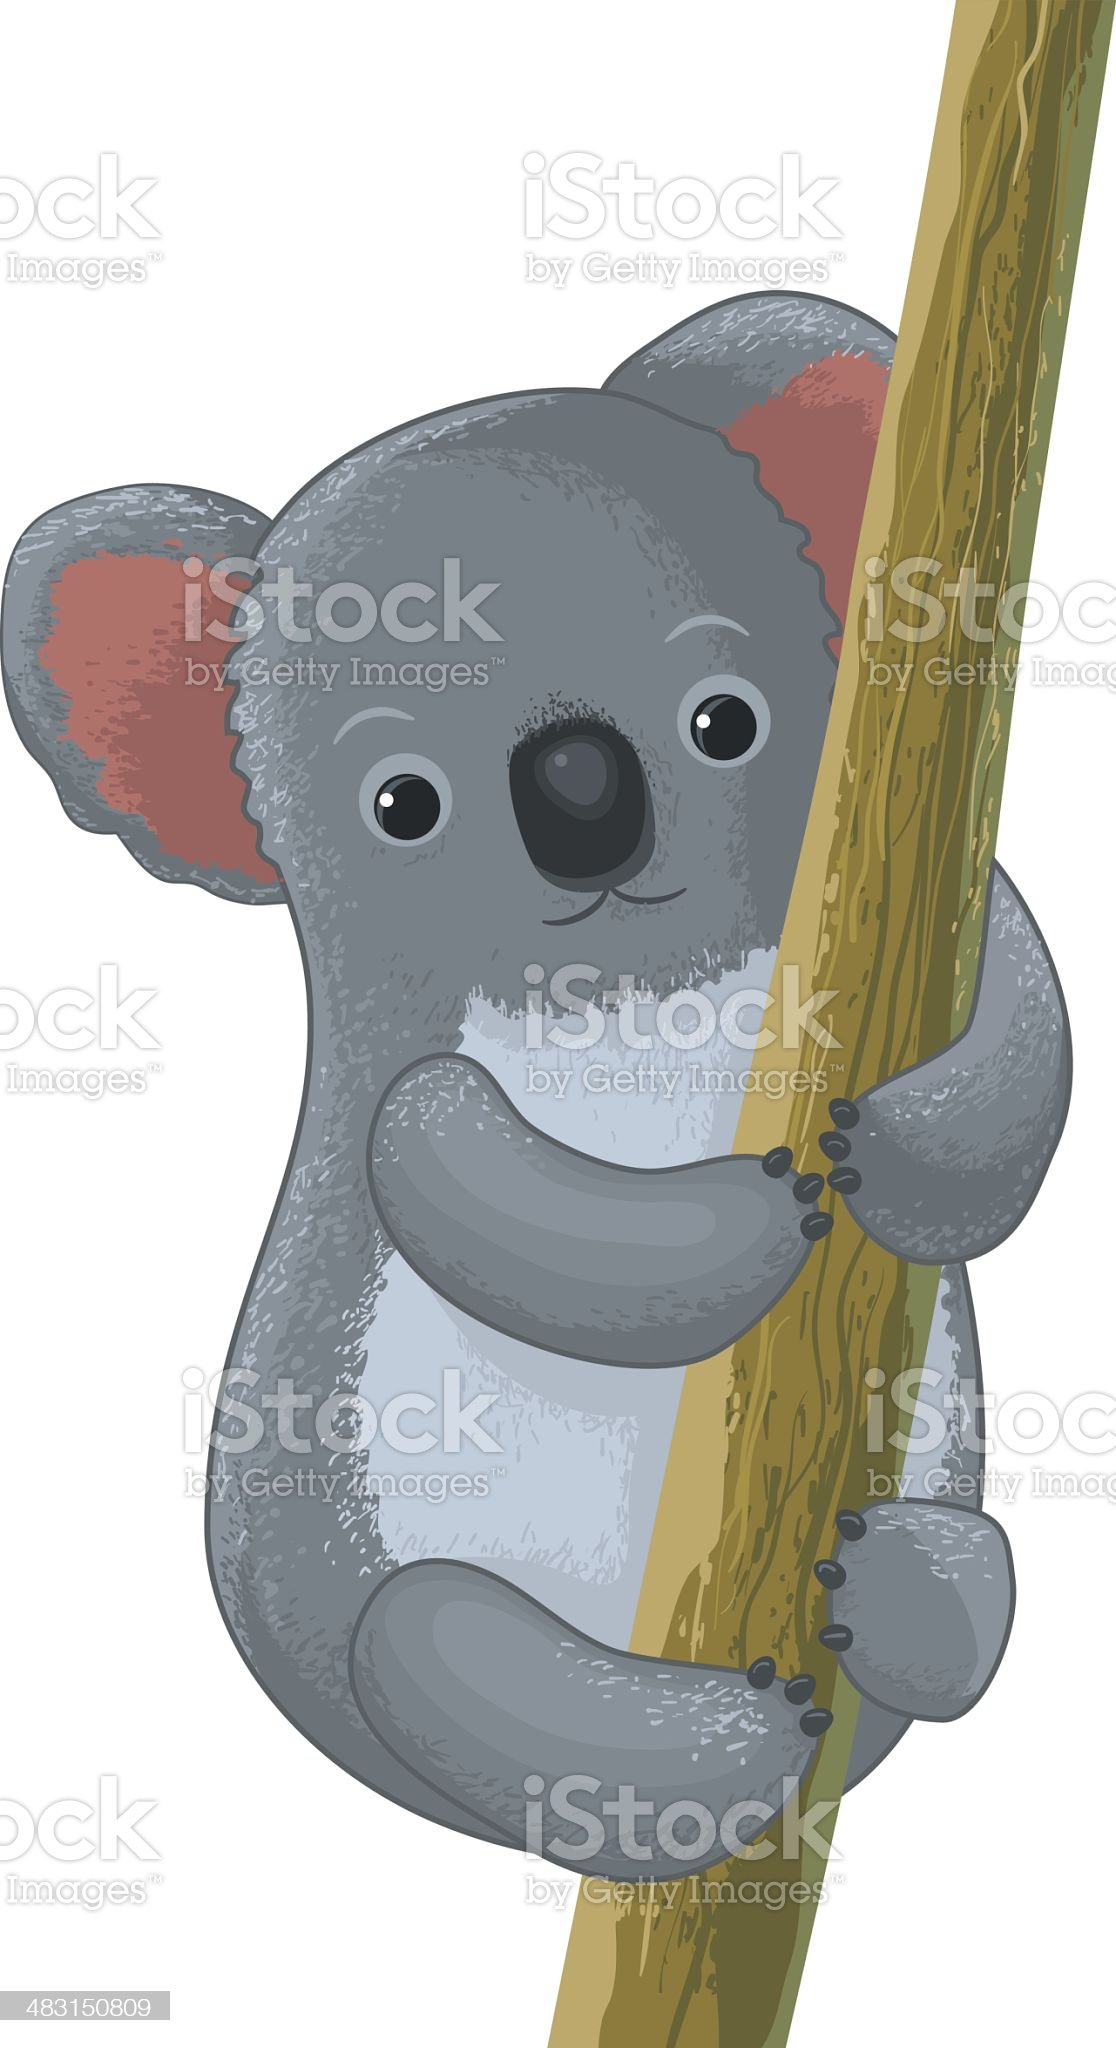 koala cartoon character royalty-free stock vector art